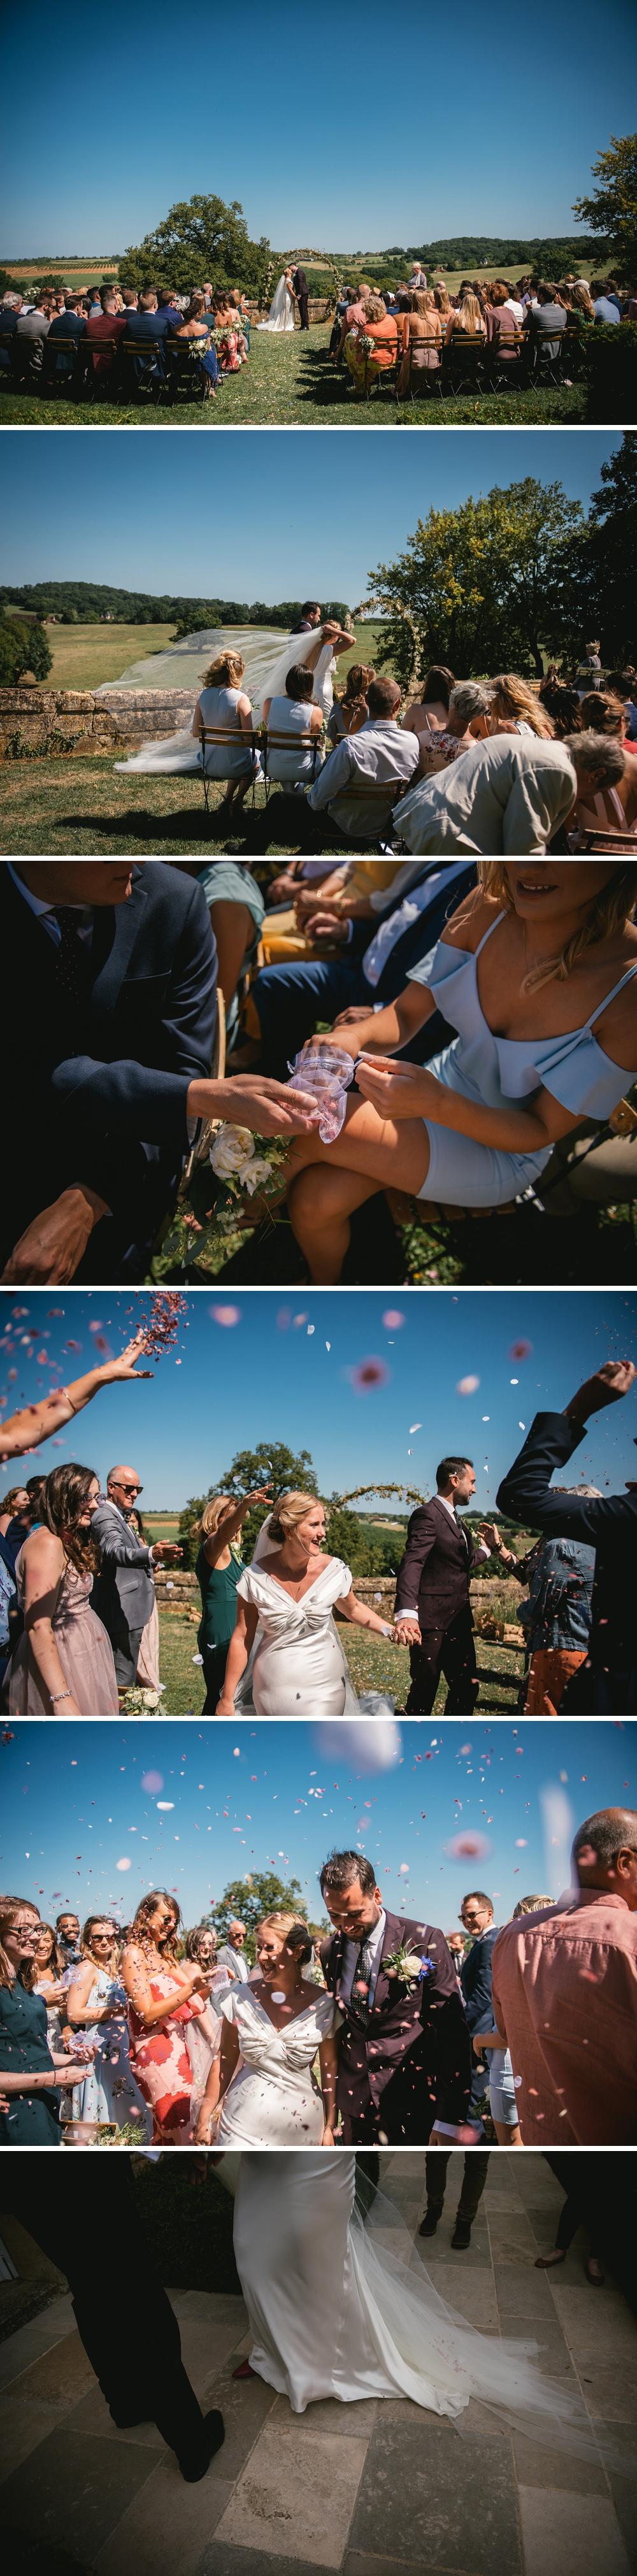 mariage golf club saint tropez zephyr luna photographe mariage st tropez